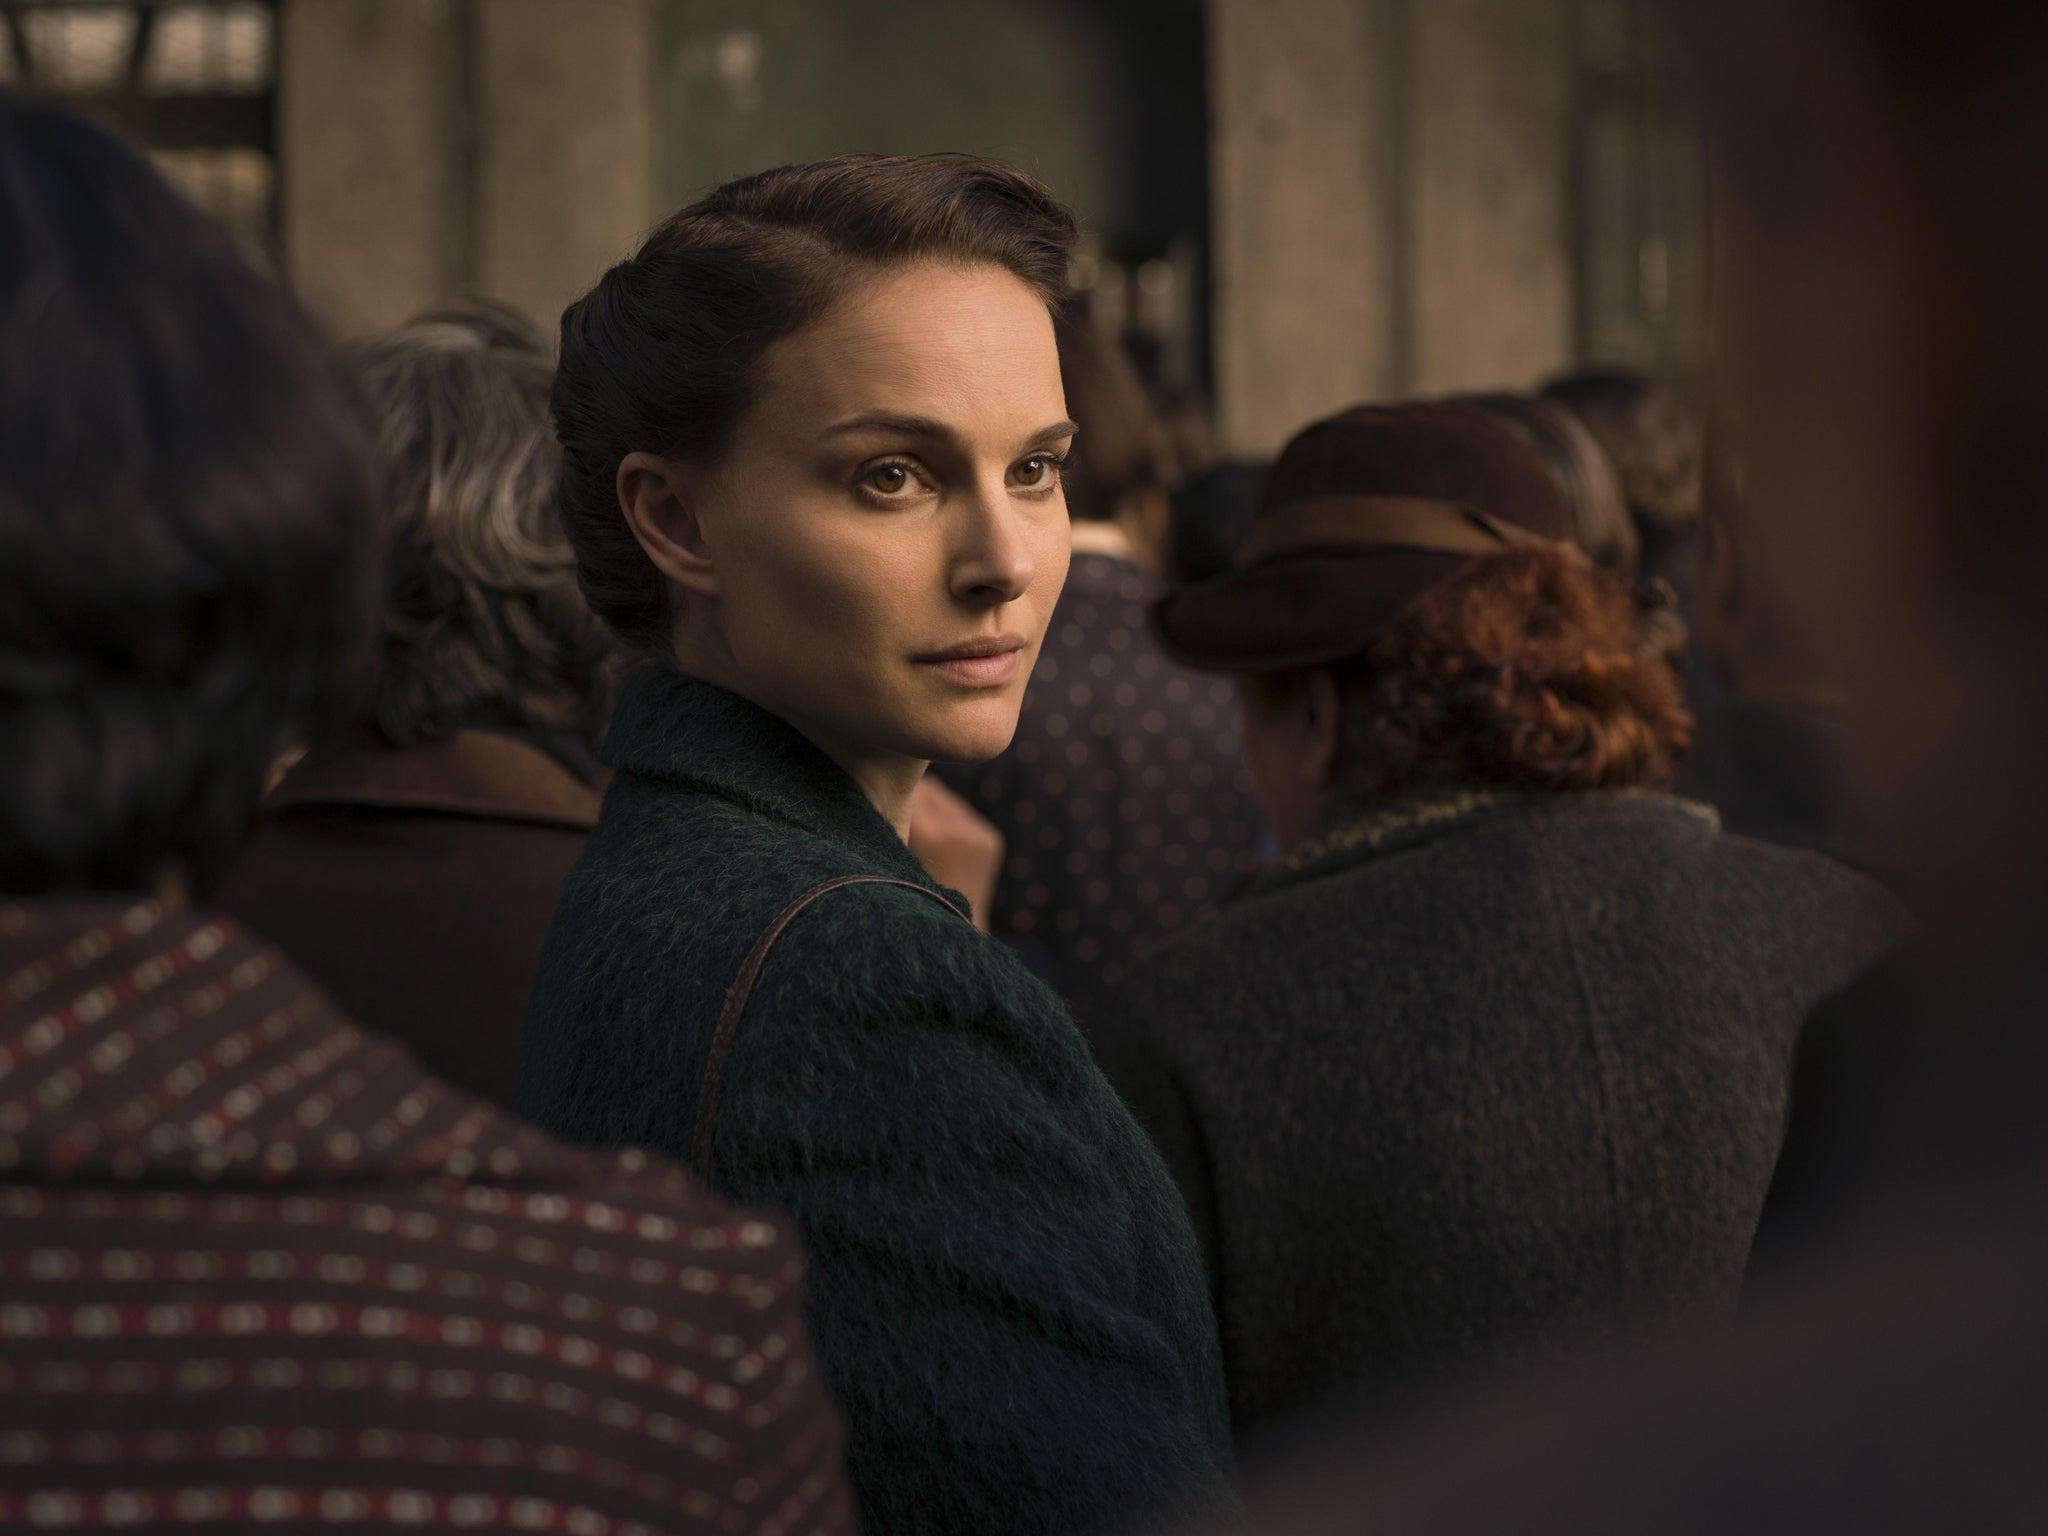 Natalie Portman interview: Black Swan actress talks anti